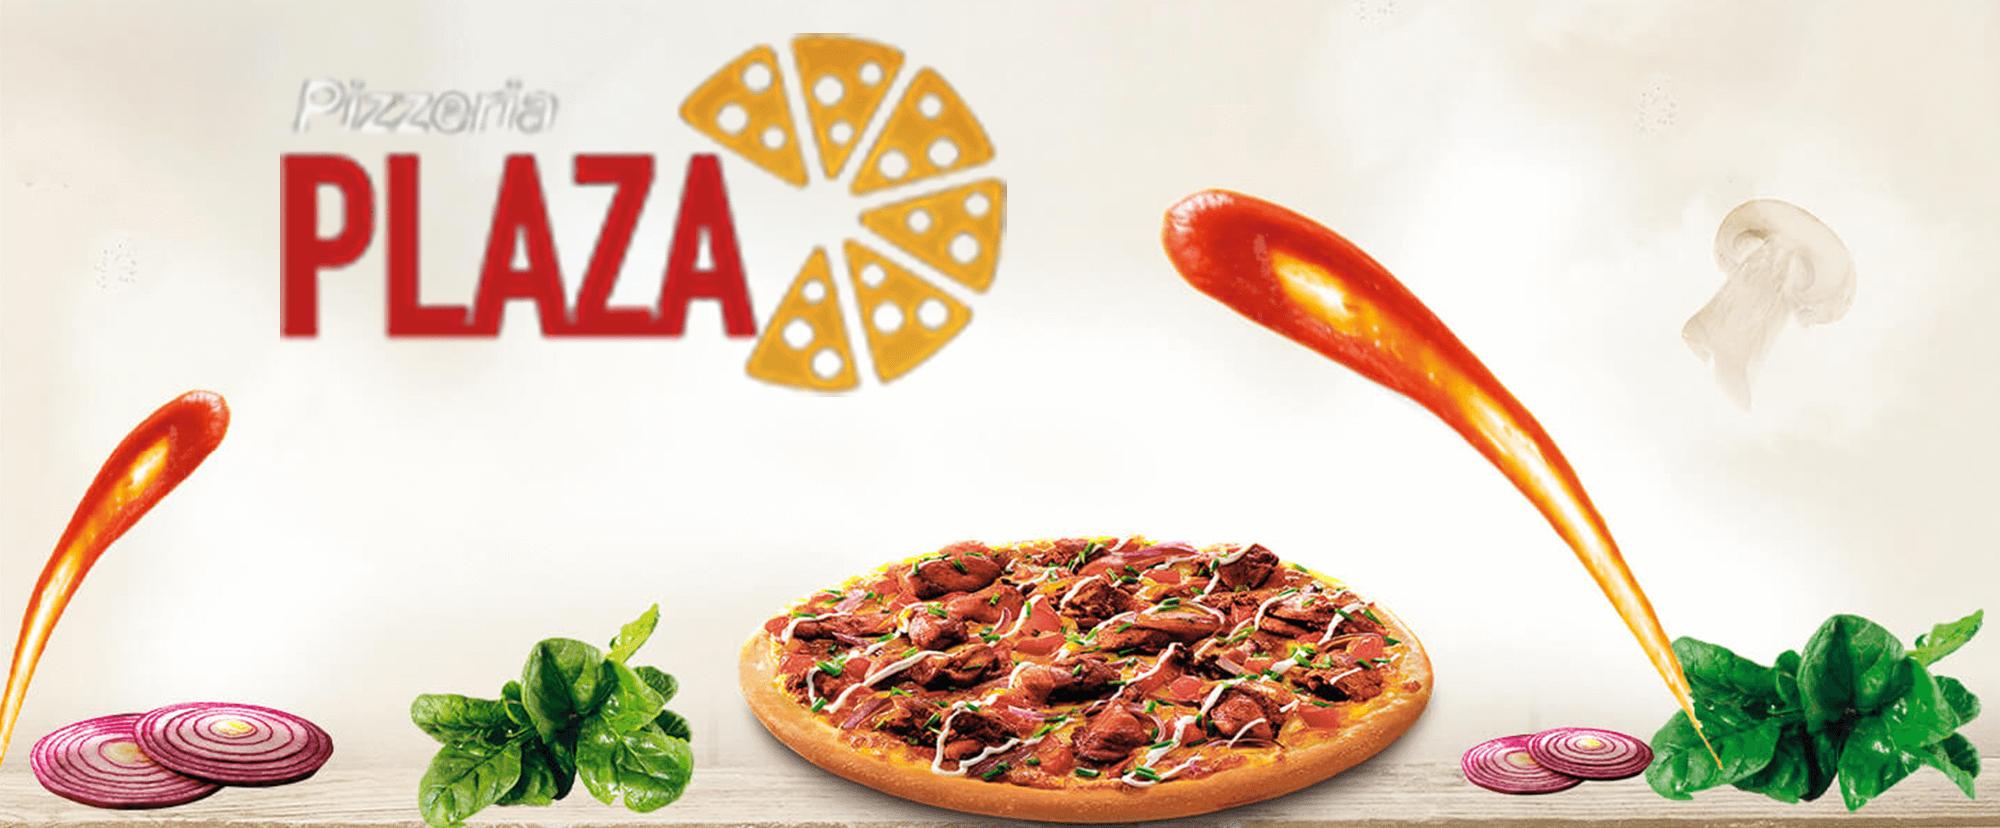 Brandcrock-pizza-plaza_image